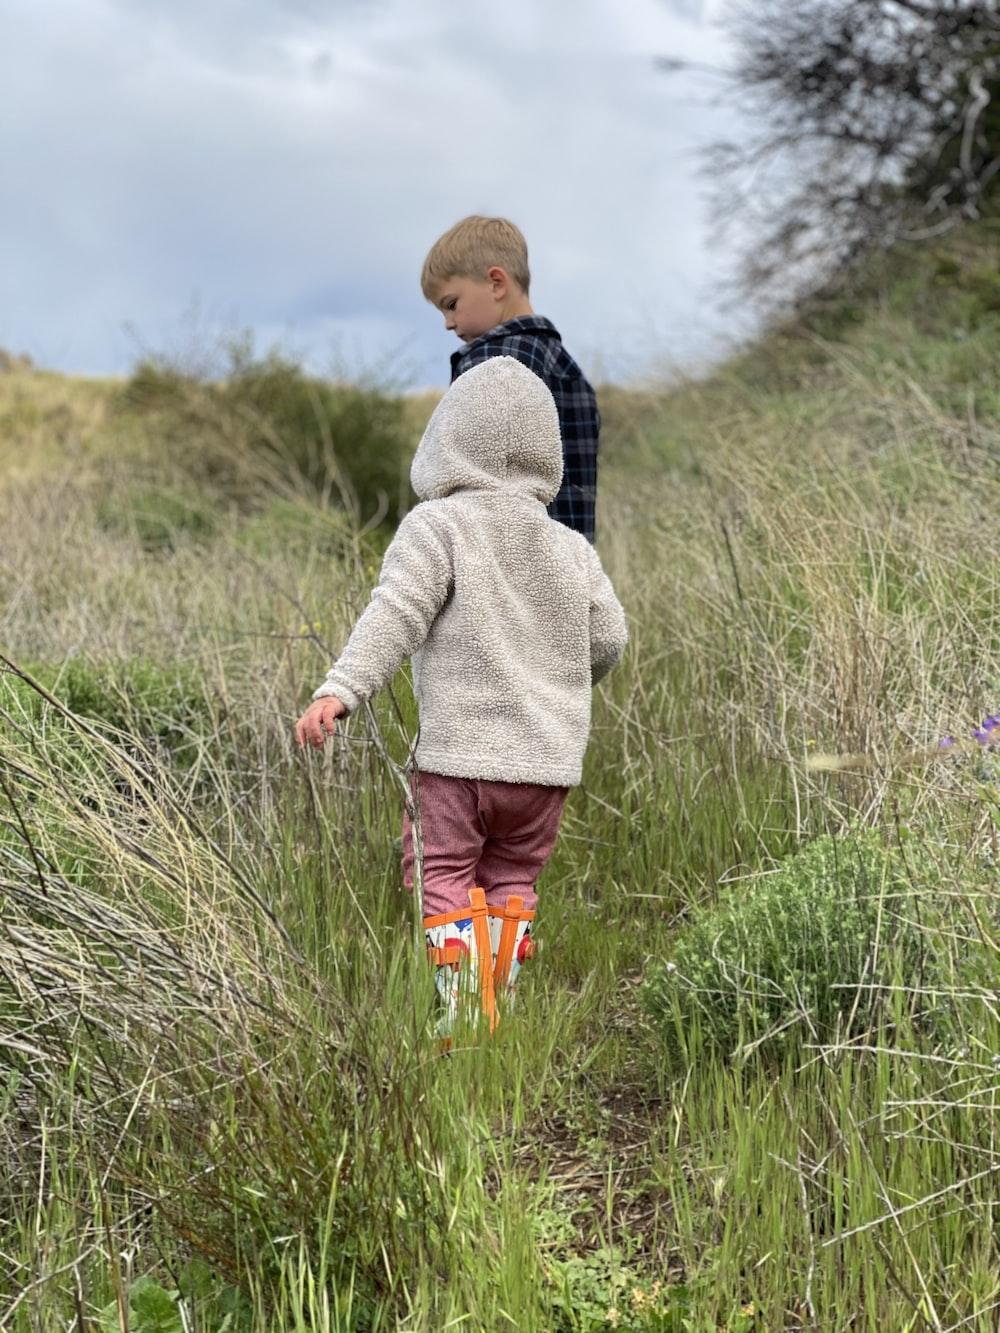 boy in gray hoodie walking on green grass field during daytime